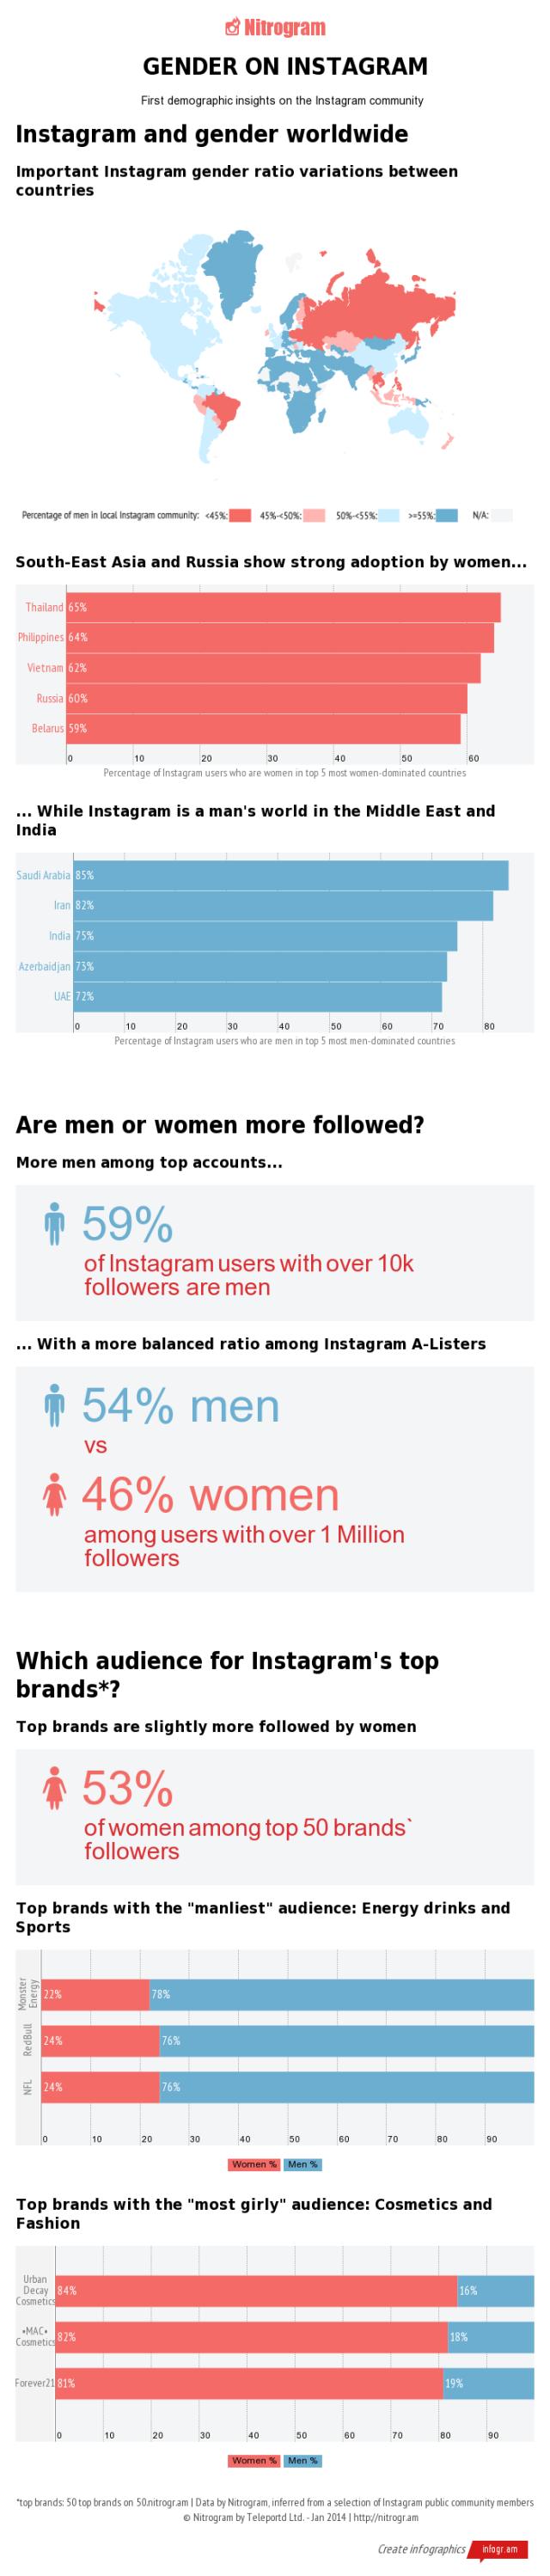 gender-on-instagram-infographic-by-nitrogram